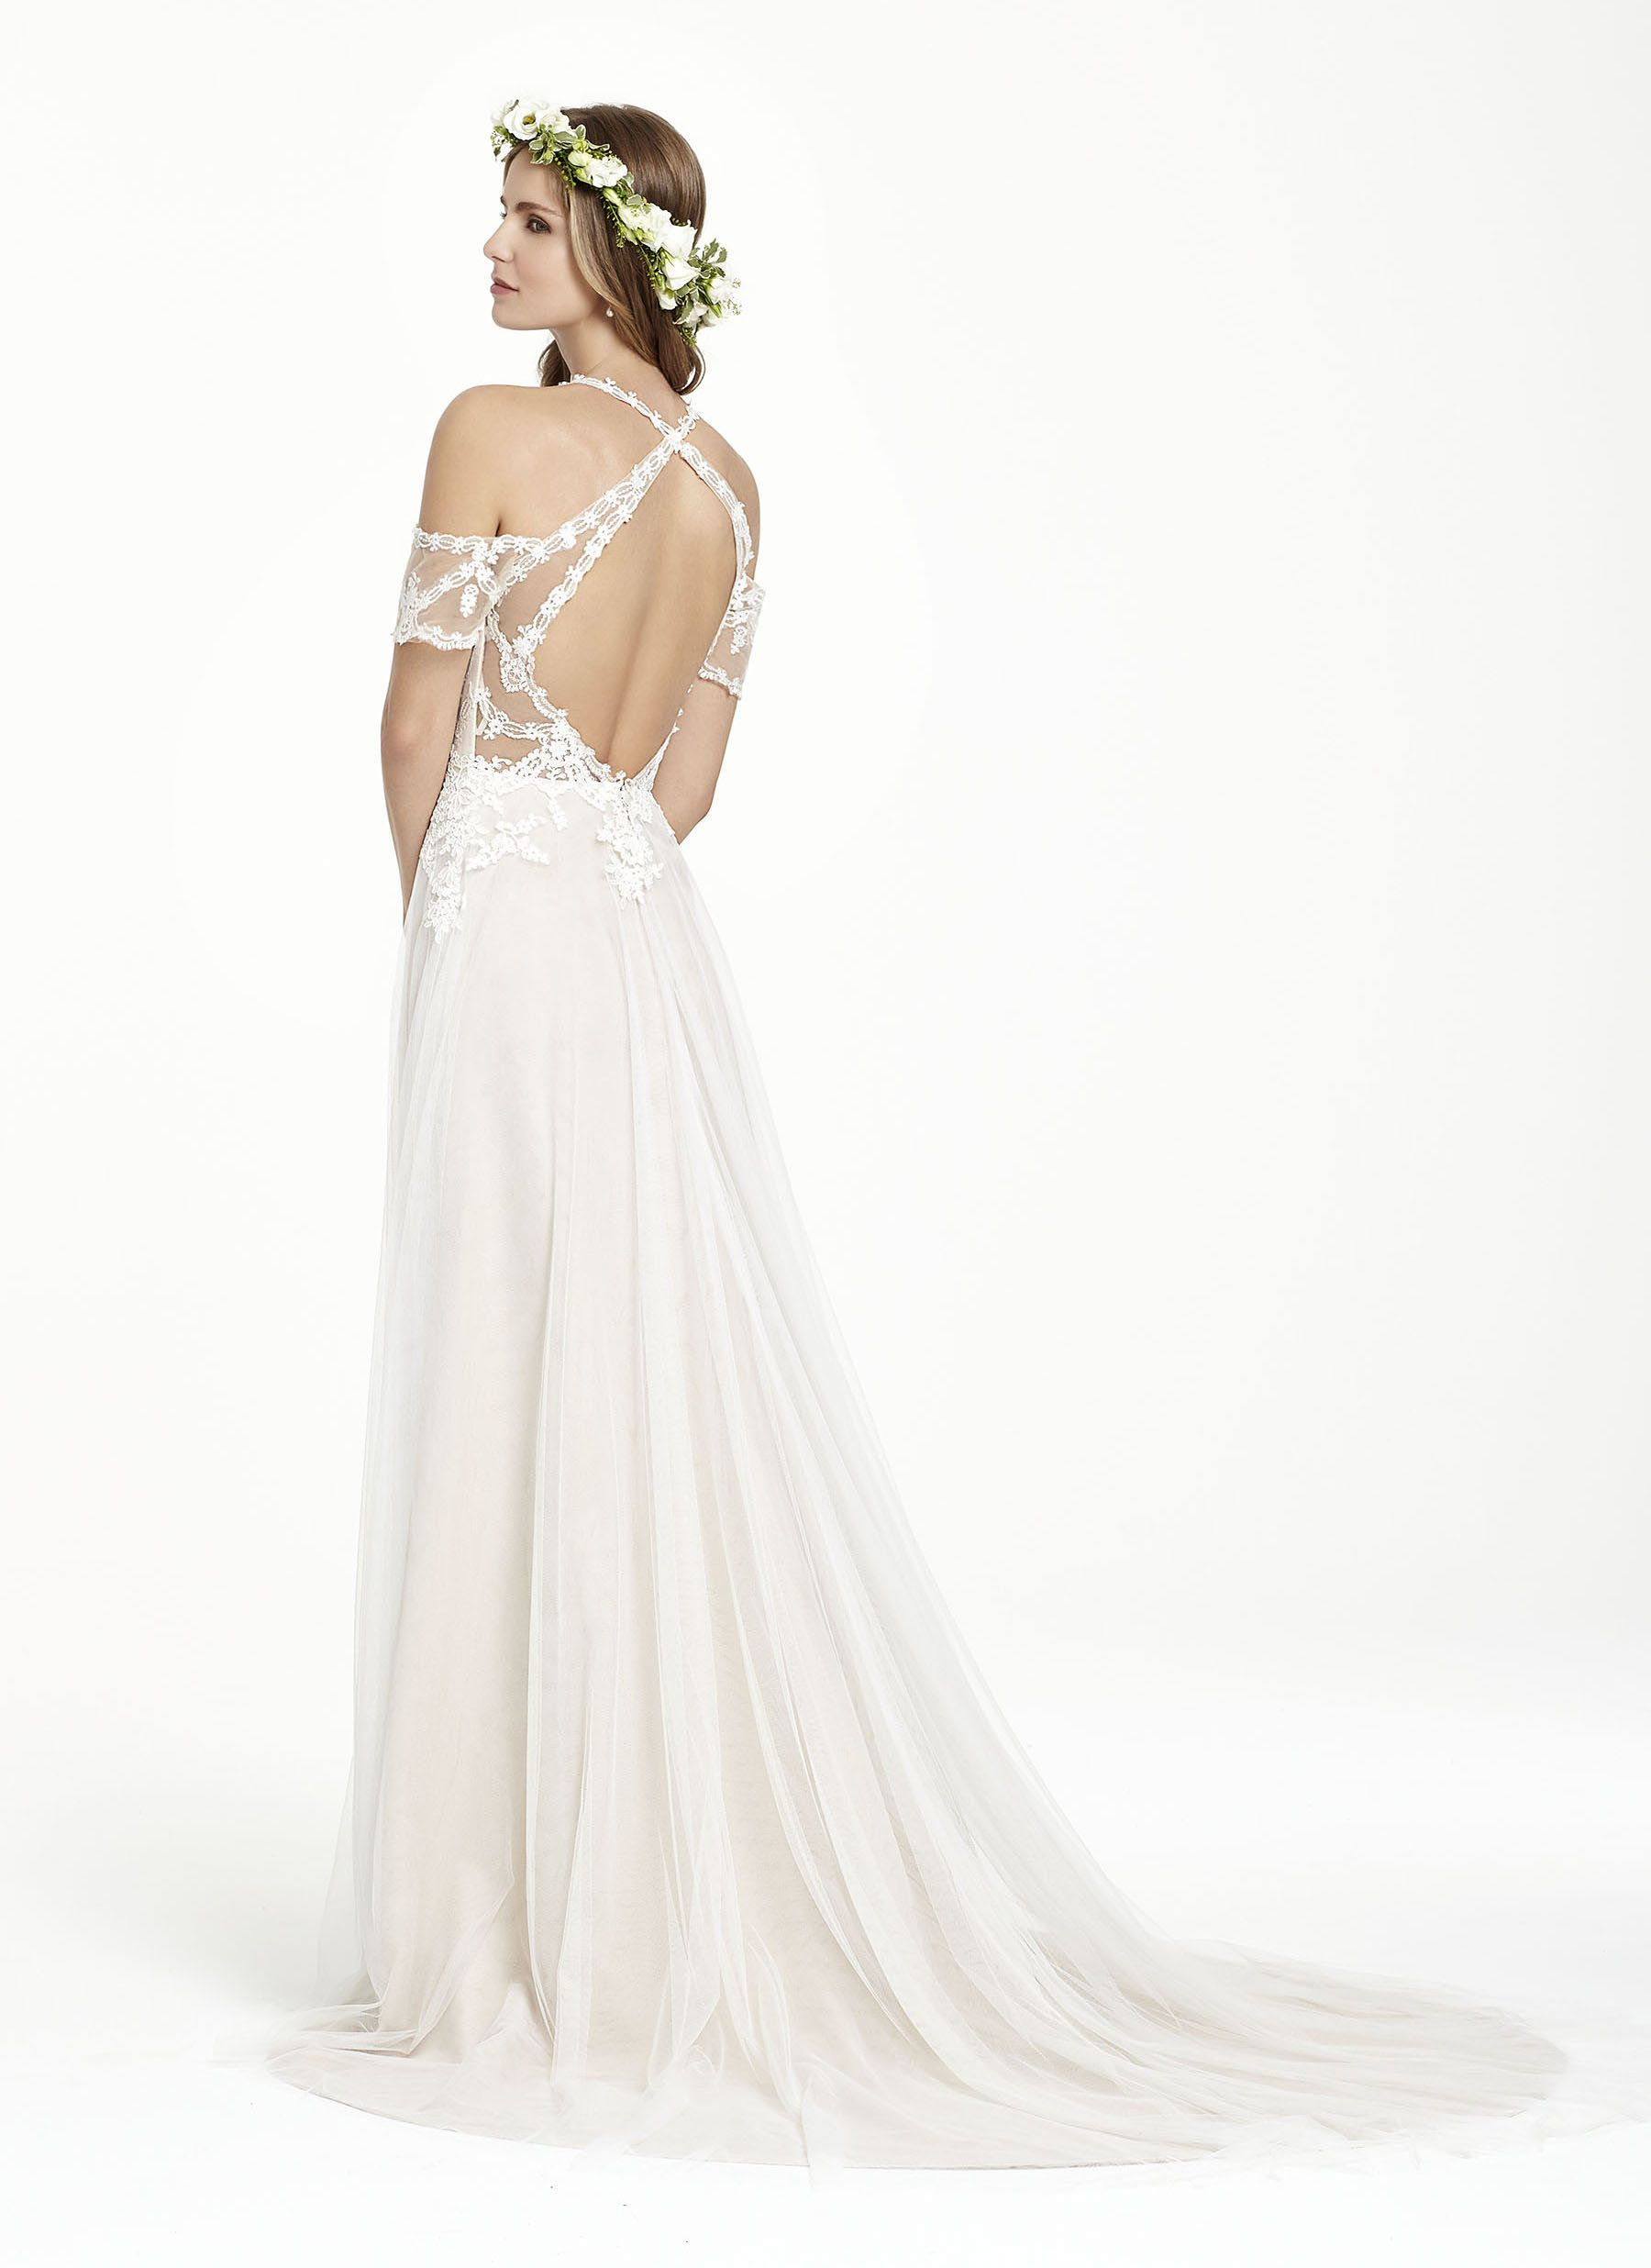 Boho wedding dress open back wedding dress outside wedding dress